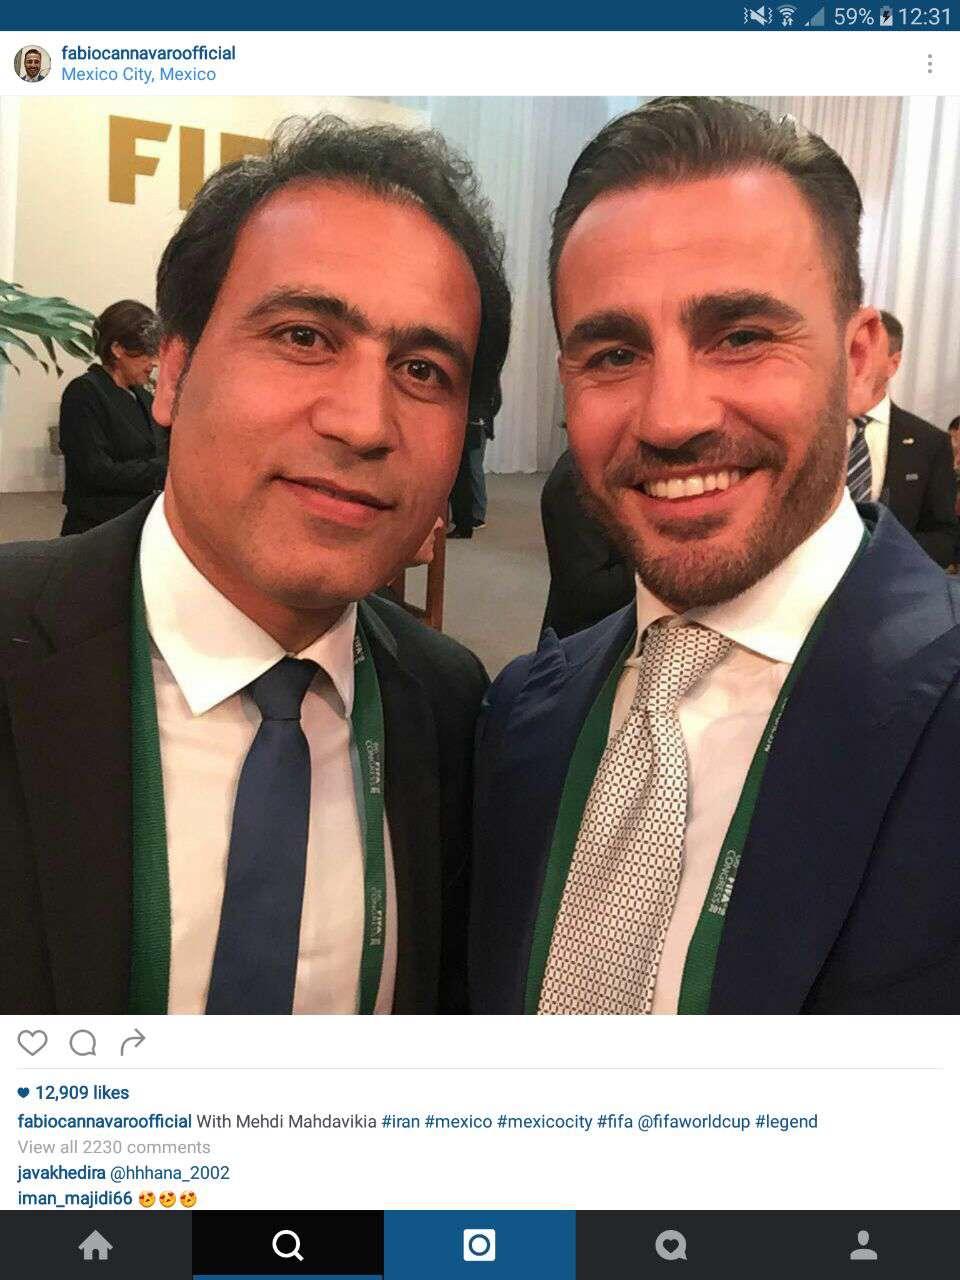 فابیو کاناوارو ستاره سابق تیم ملی ایتالیا سلفیاش با مهدوی کیا را منتشر کرد